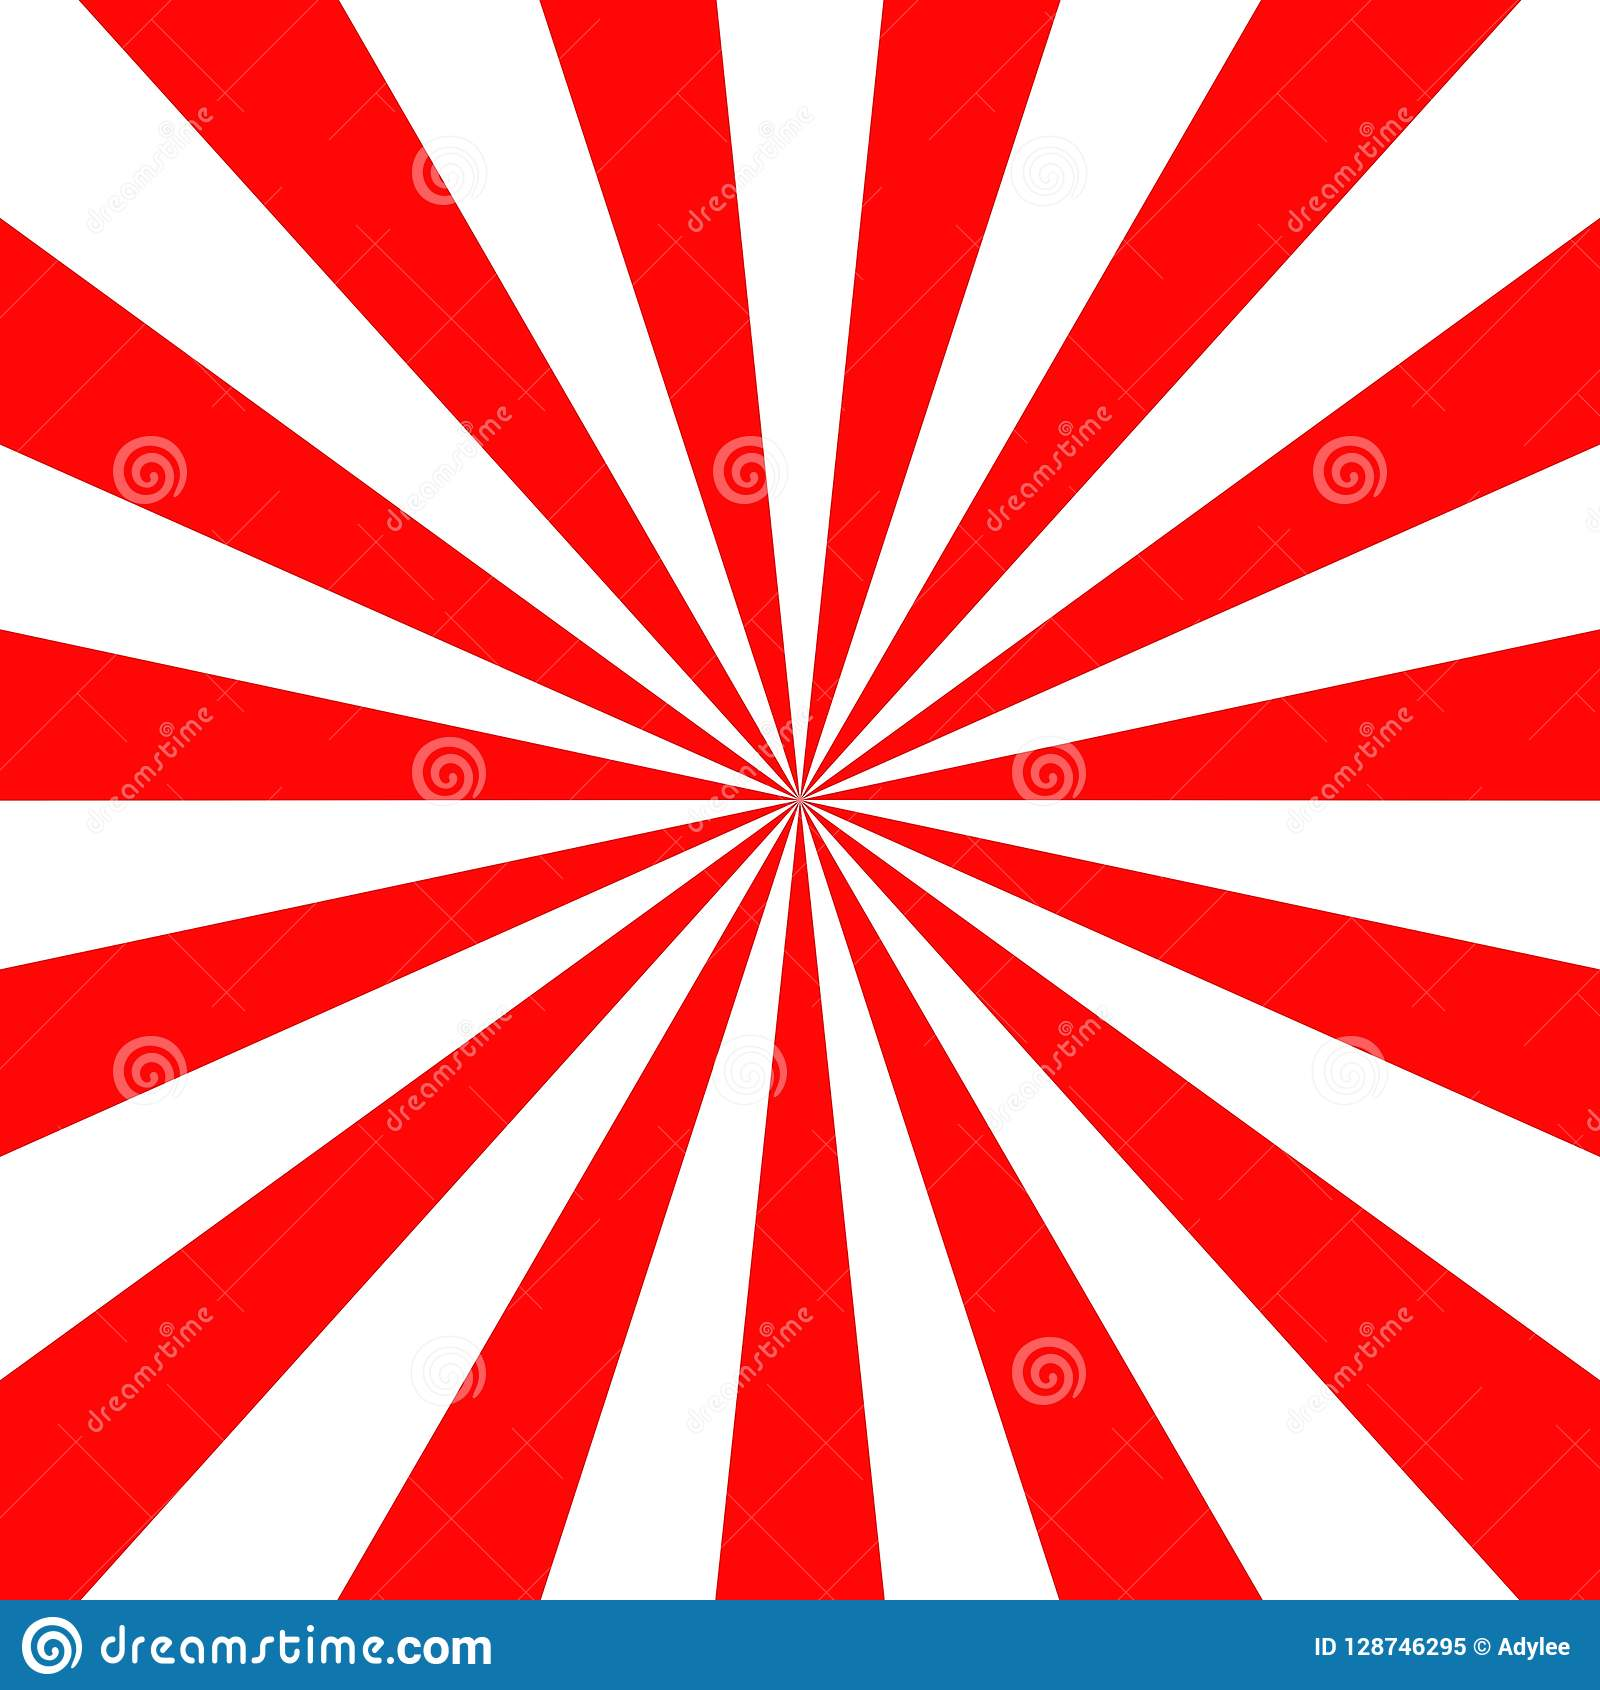 Stock Vector Japan Red Sun Wallpaper Background Vector Illustration.